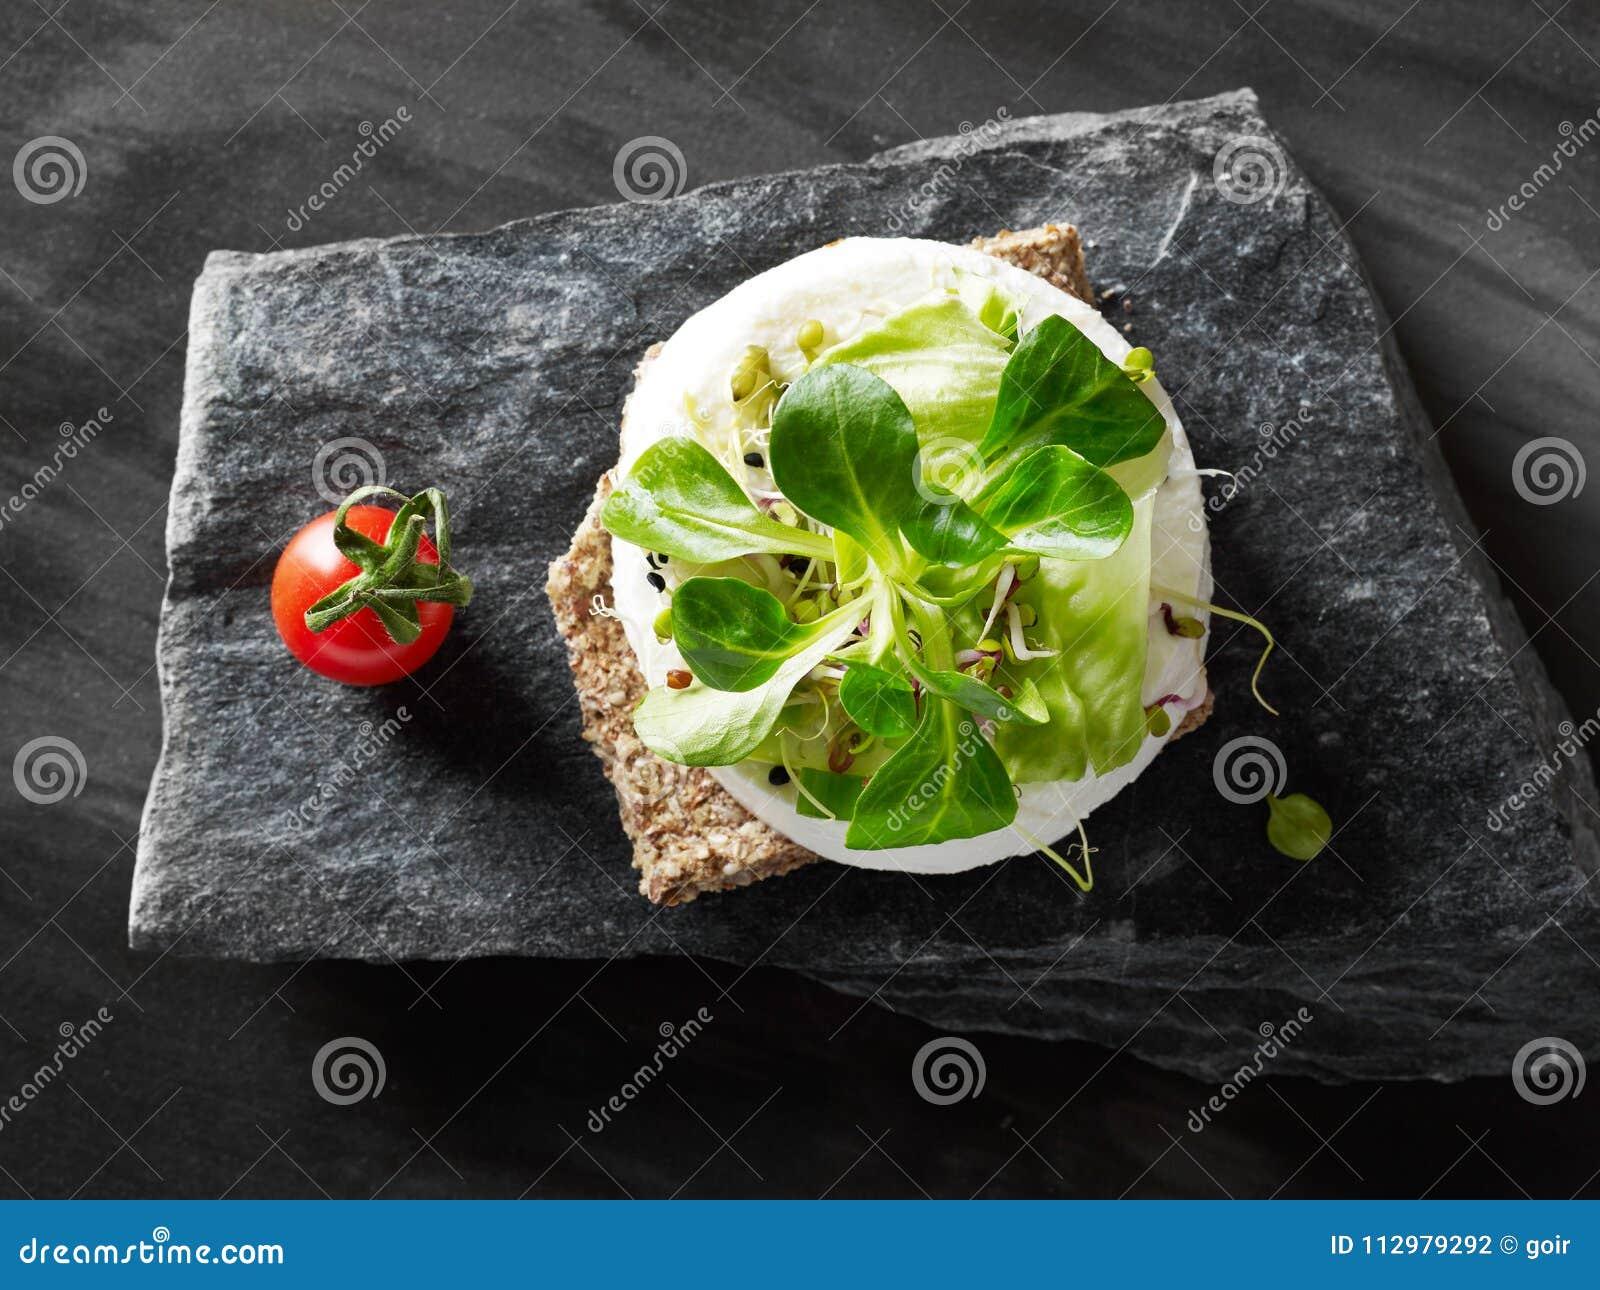 Mozzarella bruscheta from above